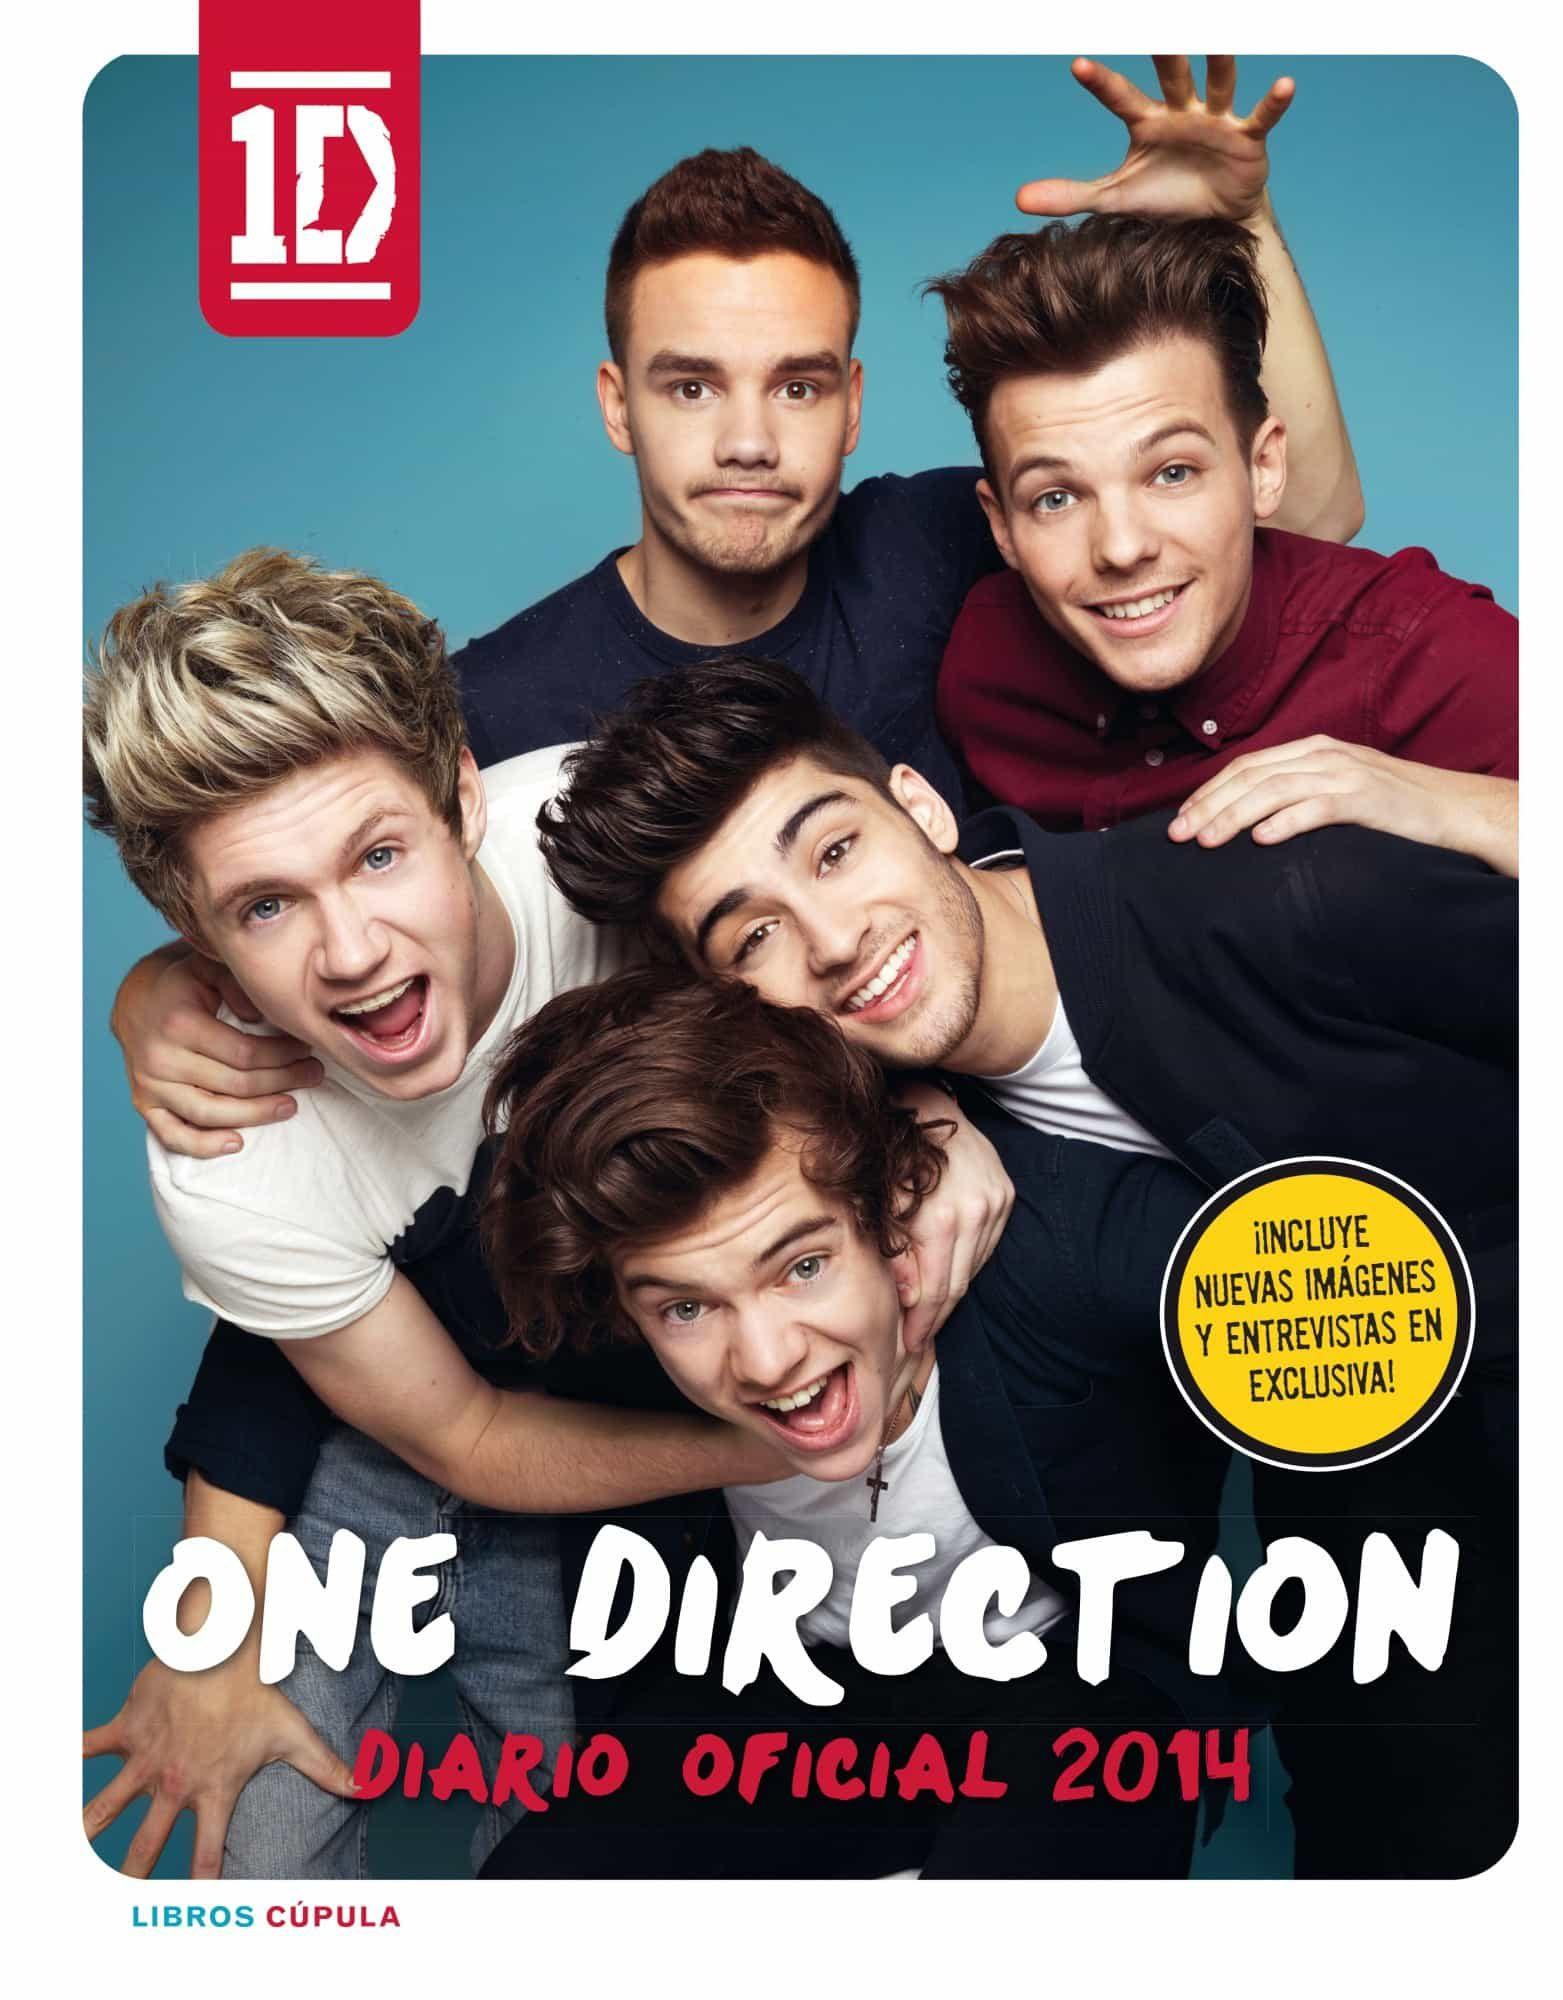 one direction: diario oficial 2014-9788448017941